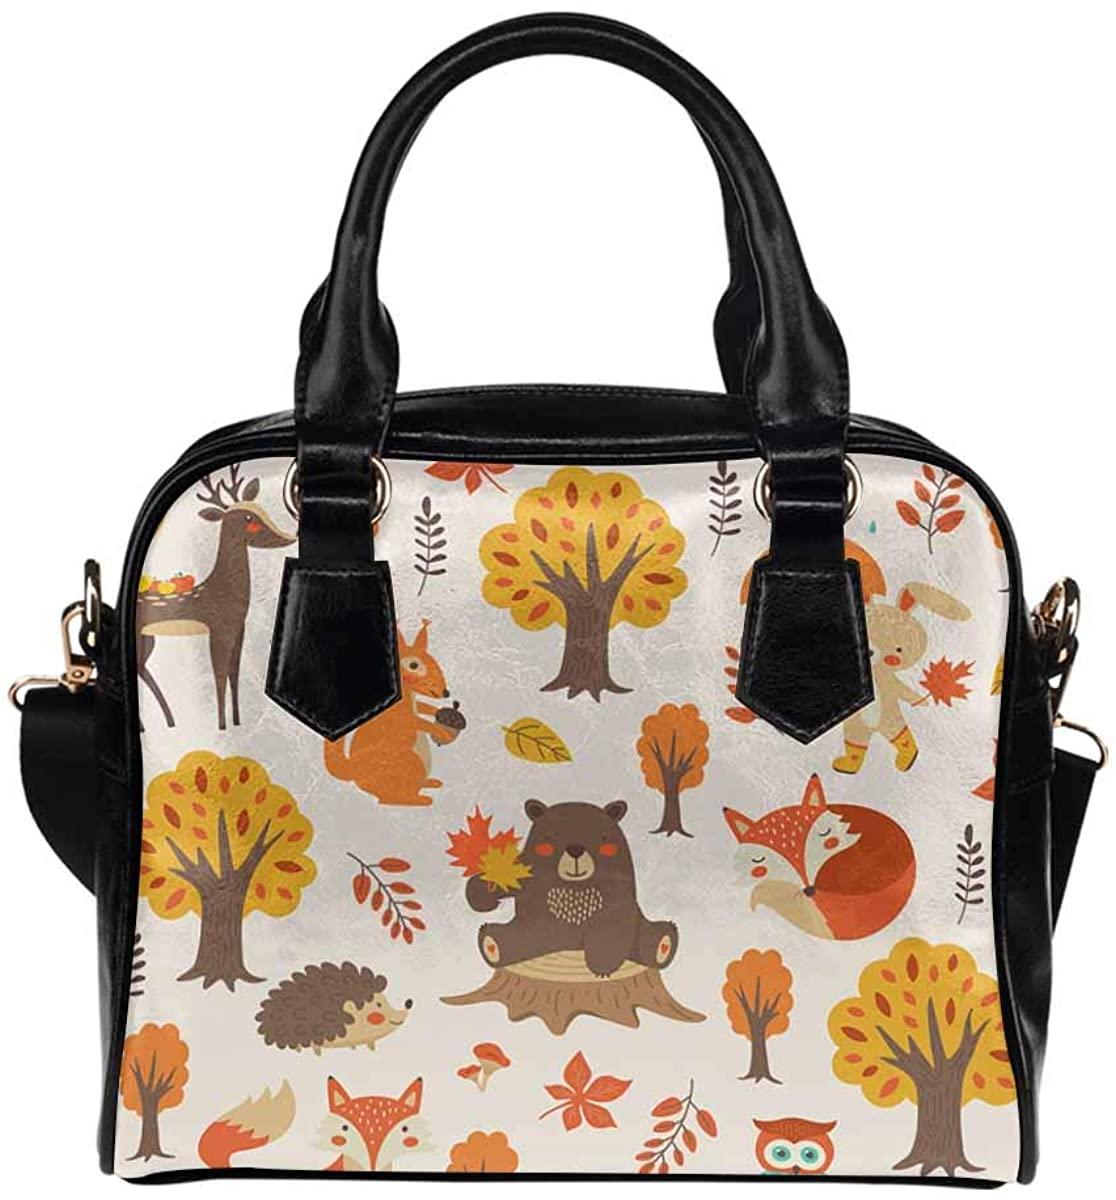 INTERESTPRINT Bear, Fox, Squirrel, Owl Deer PU Leather Lady Purses and Handbags